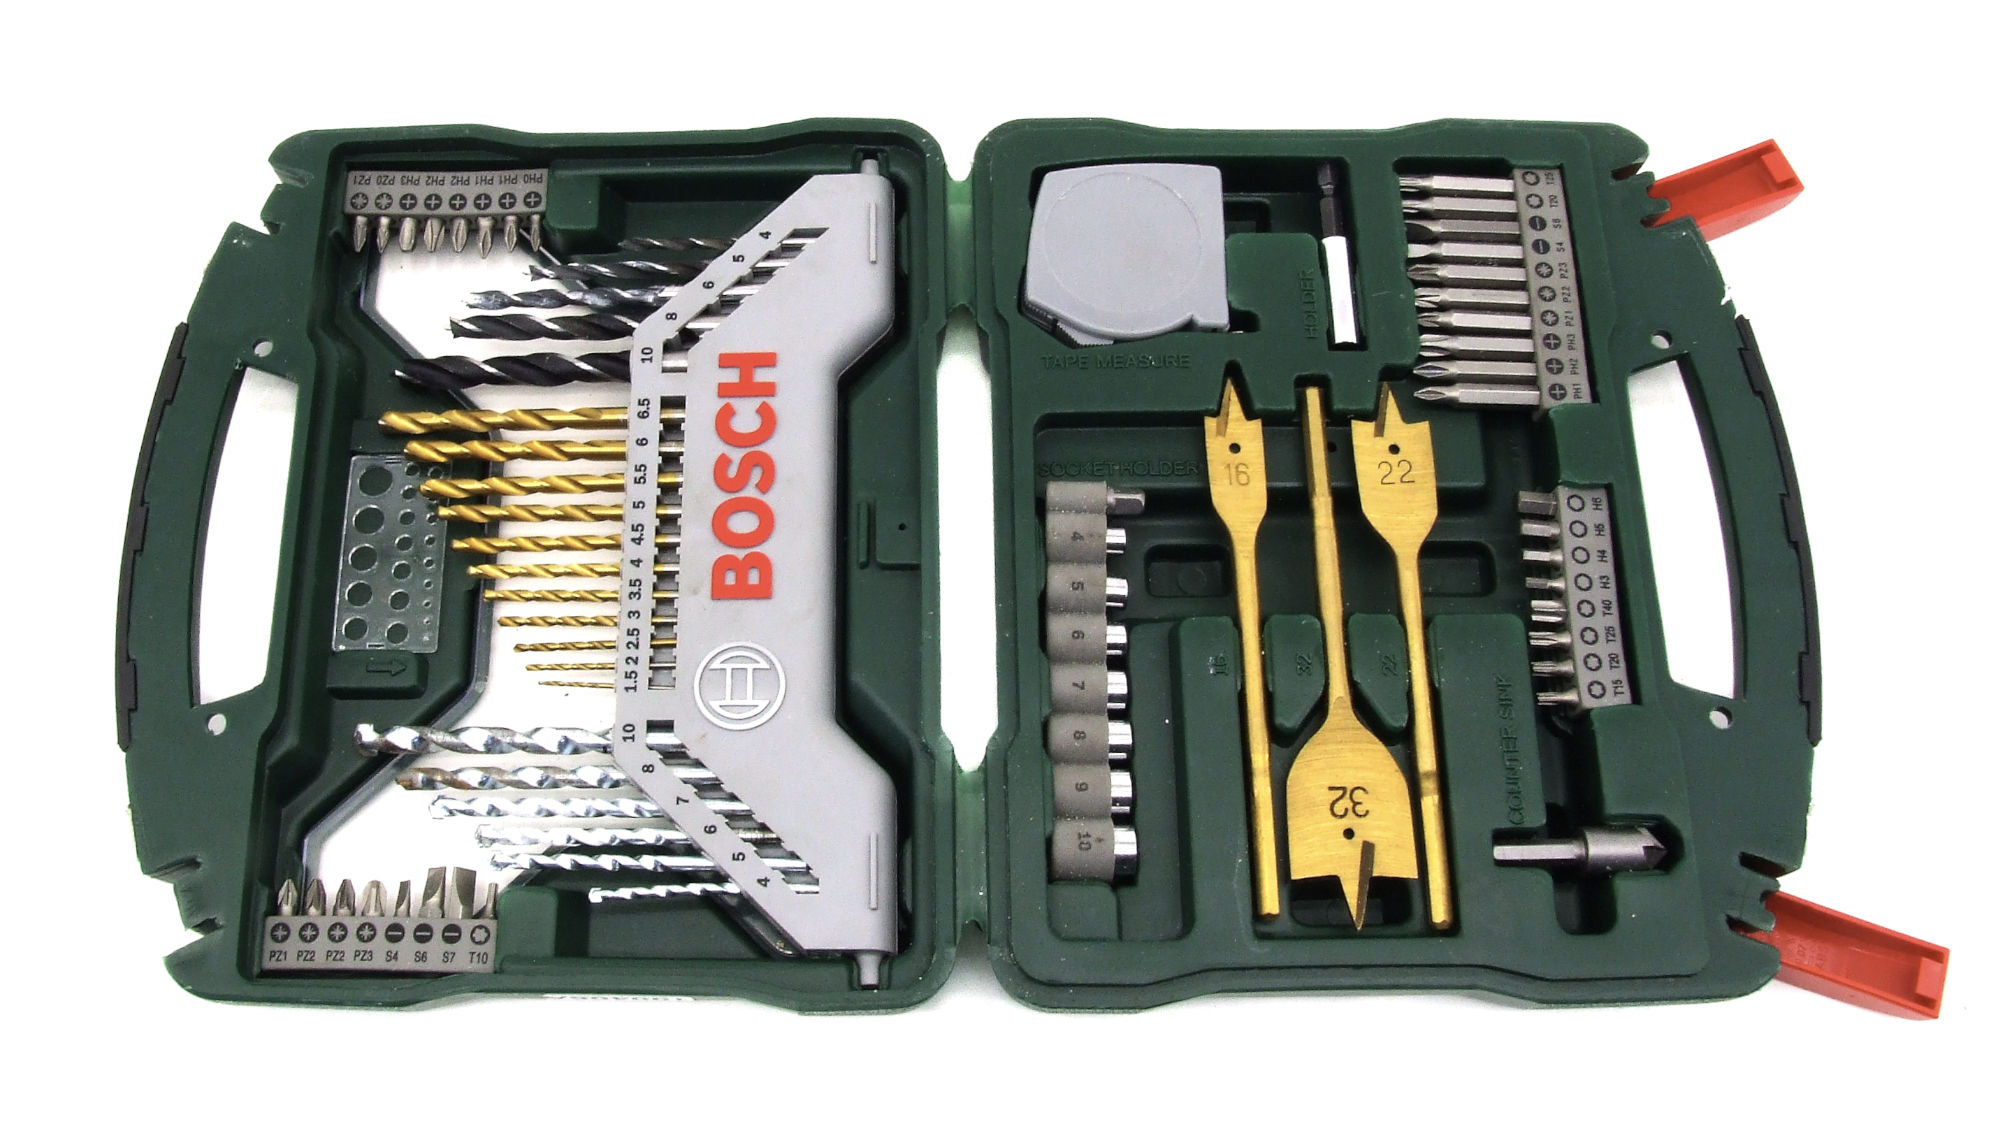 Bosch Titanium-Bohrer-Set leihen